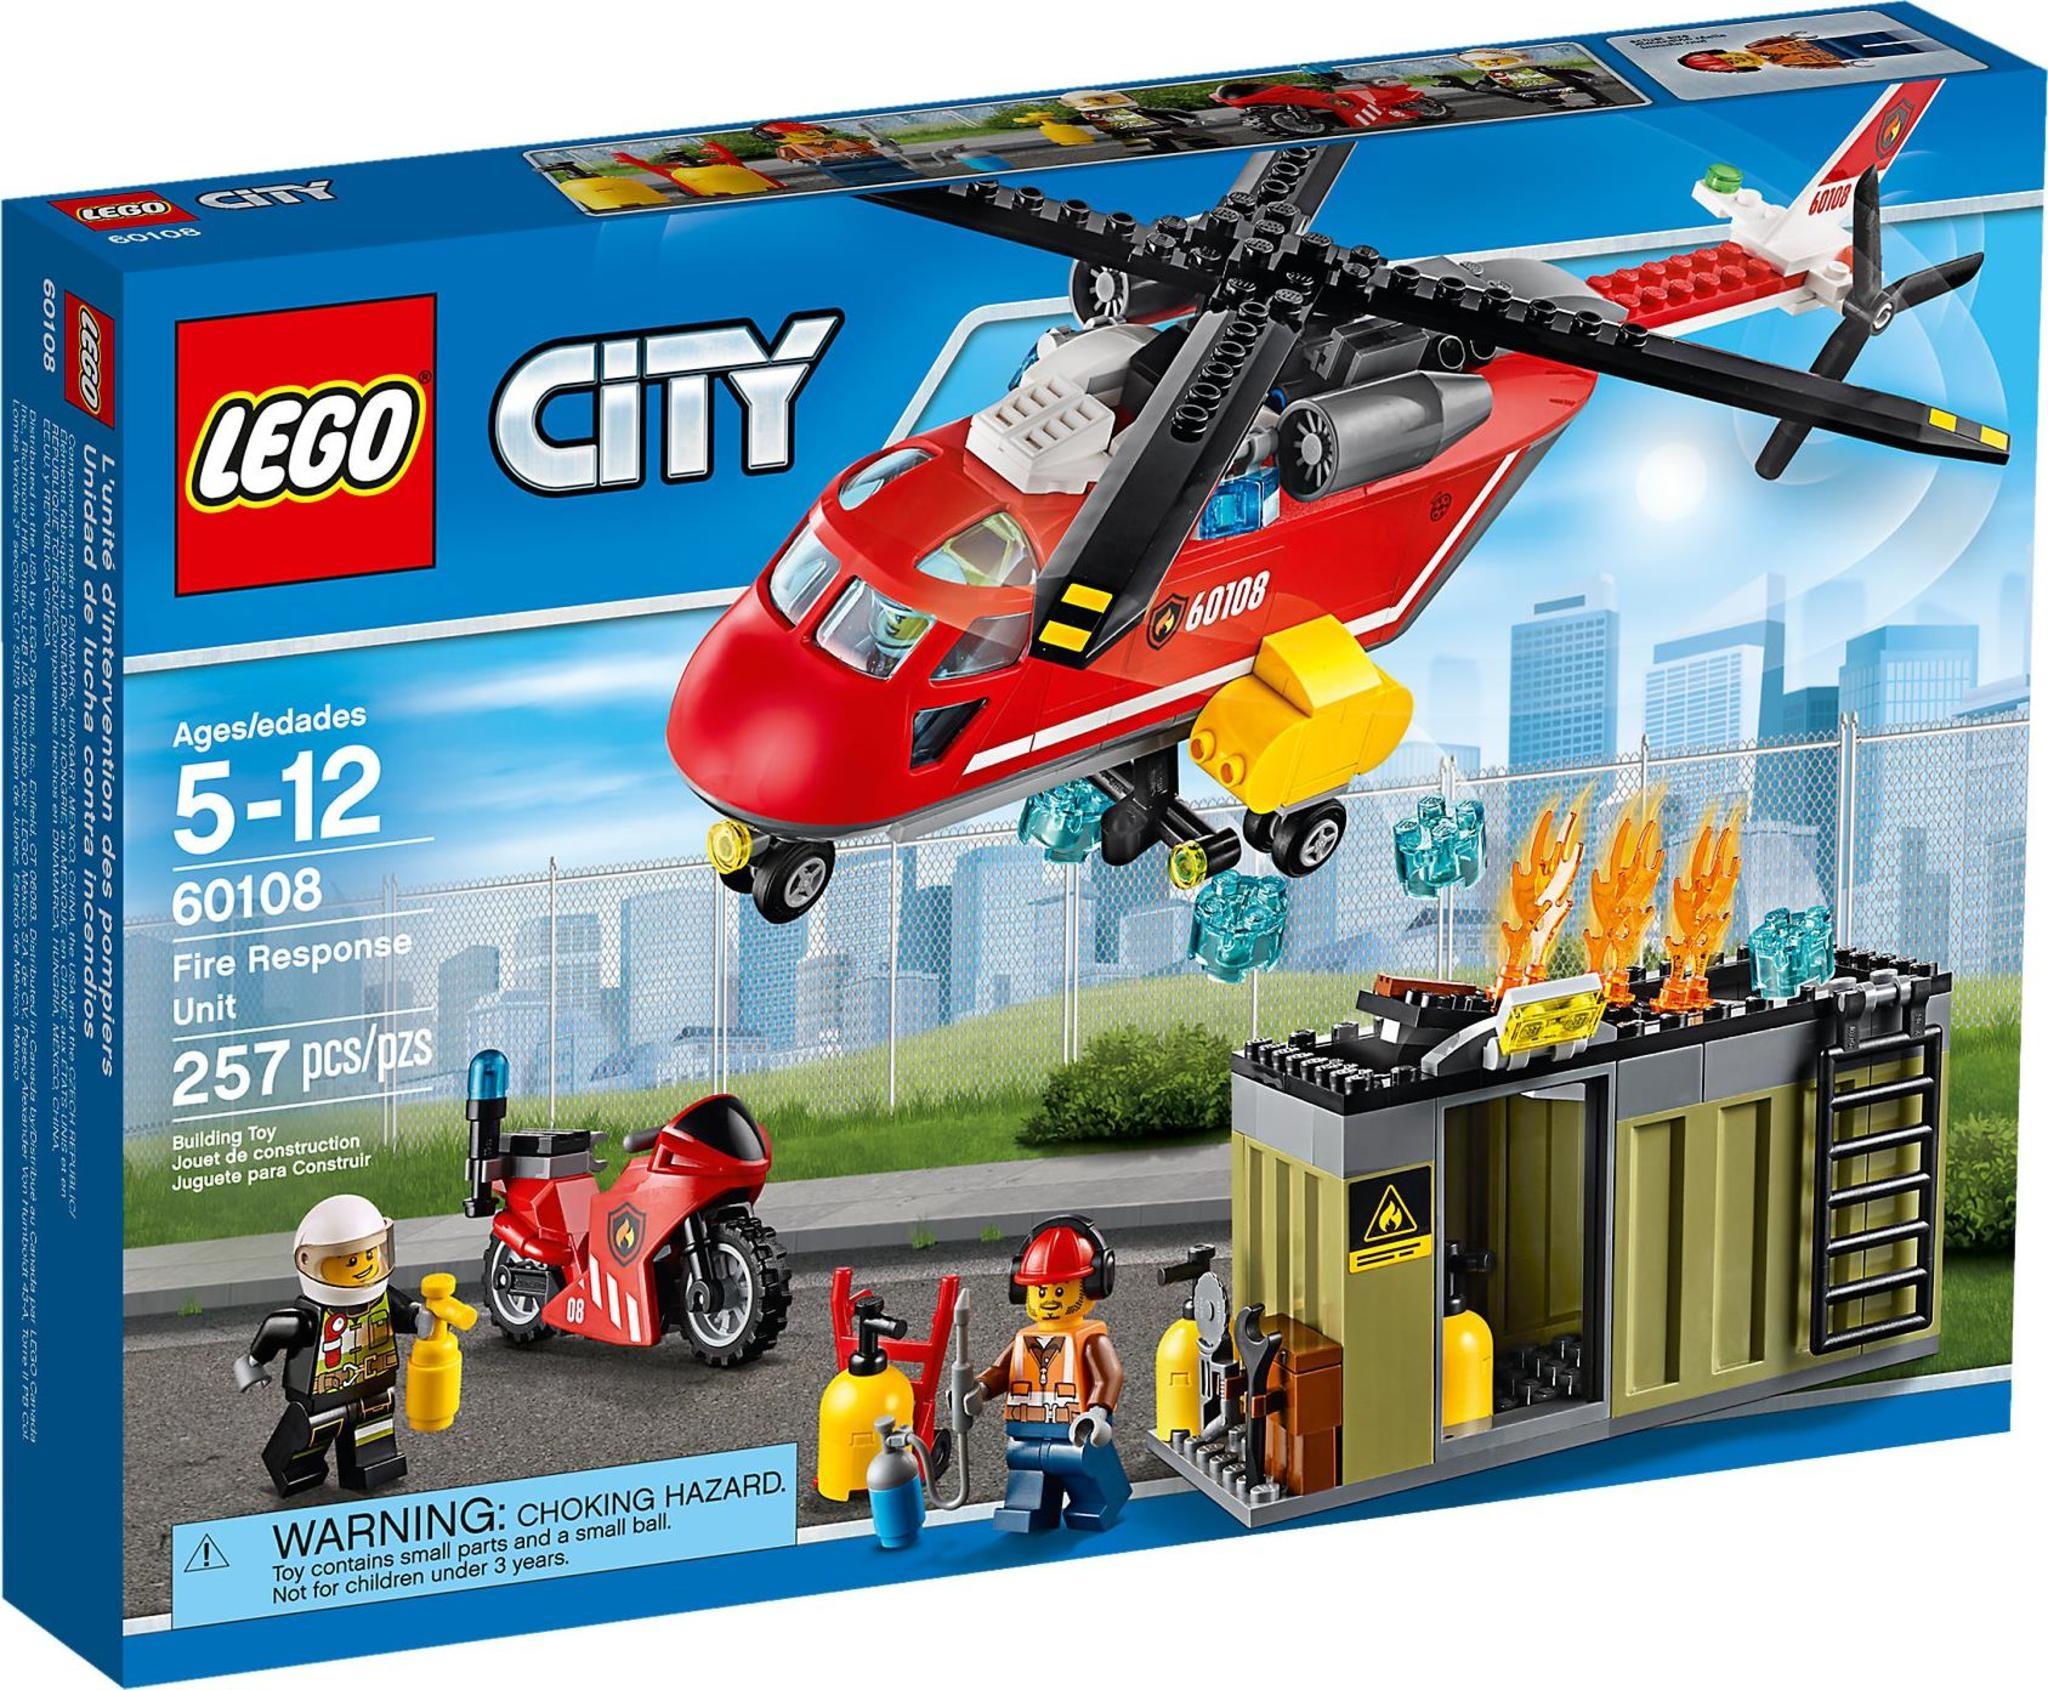 LEGO 60108 City - Fire Response Unit